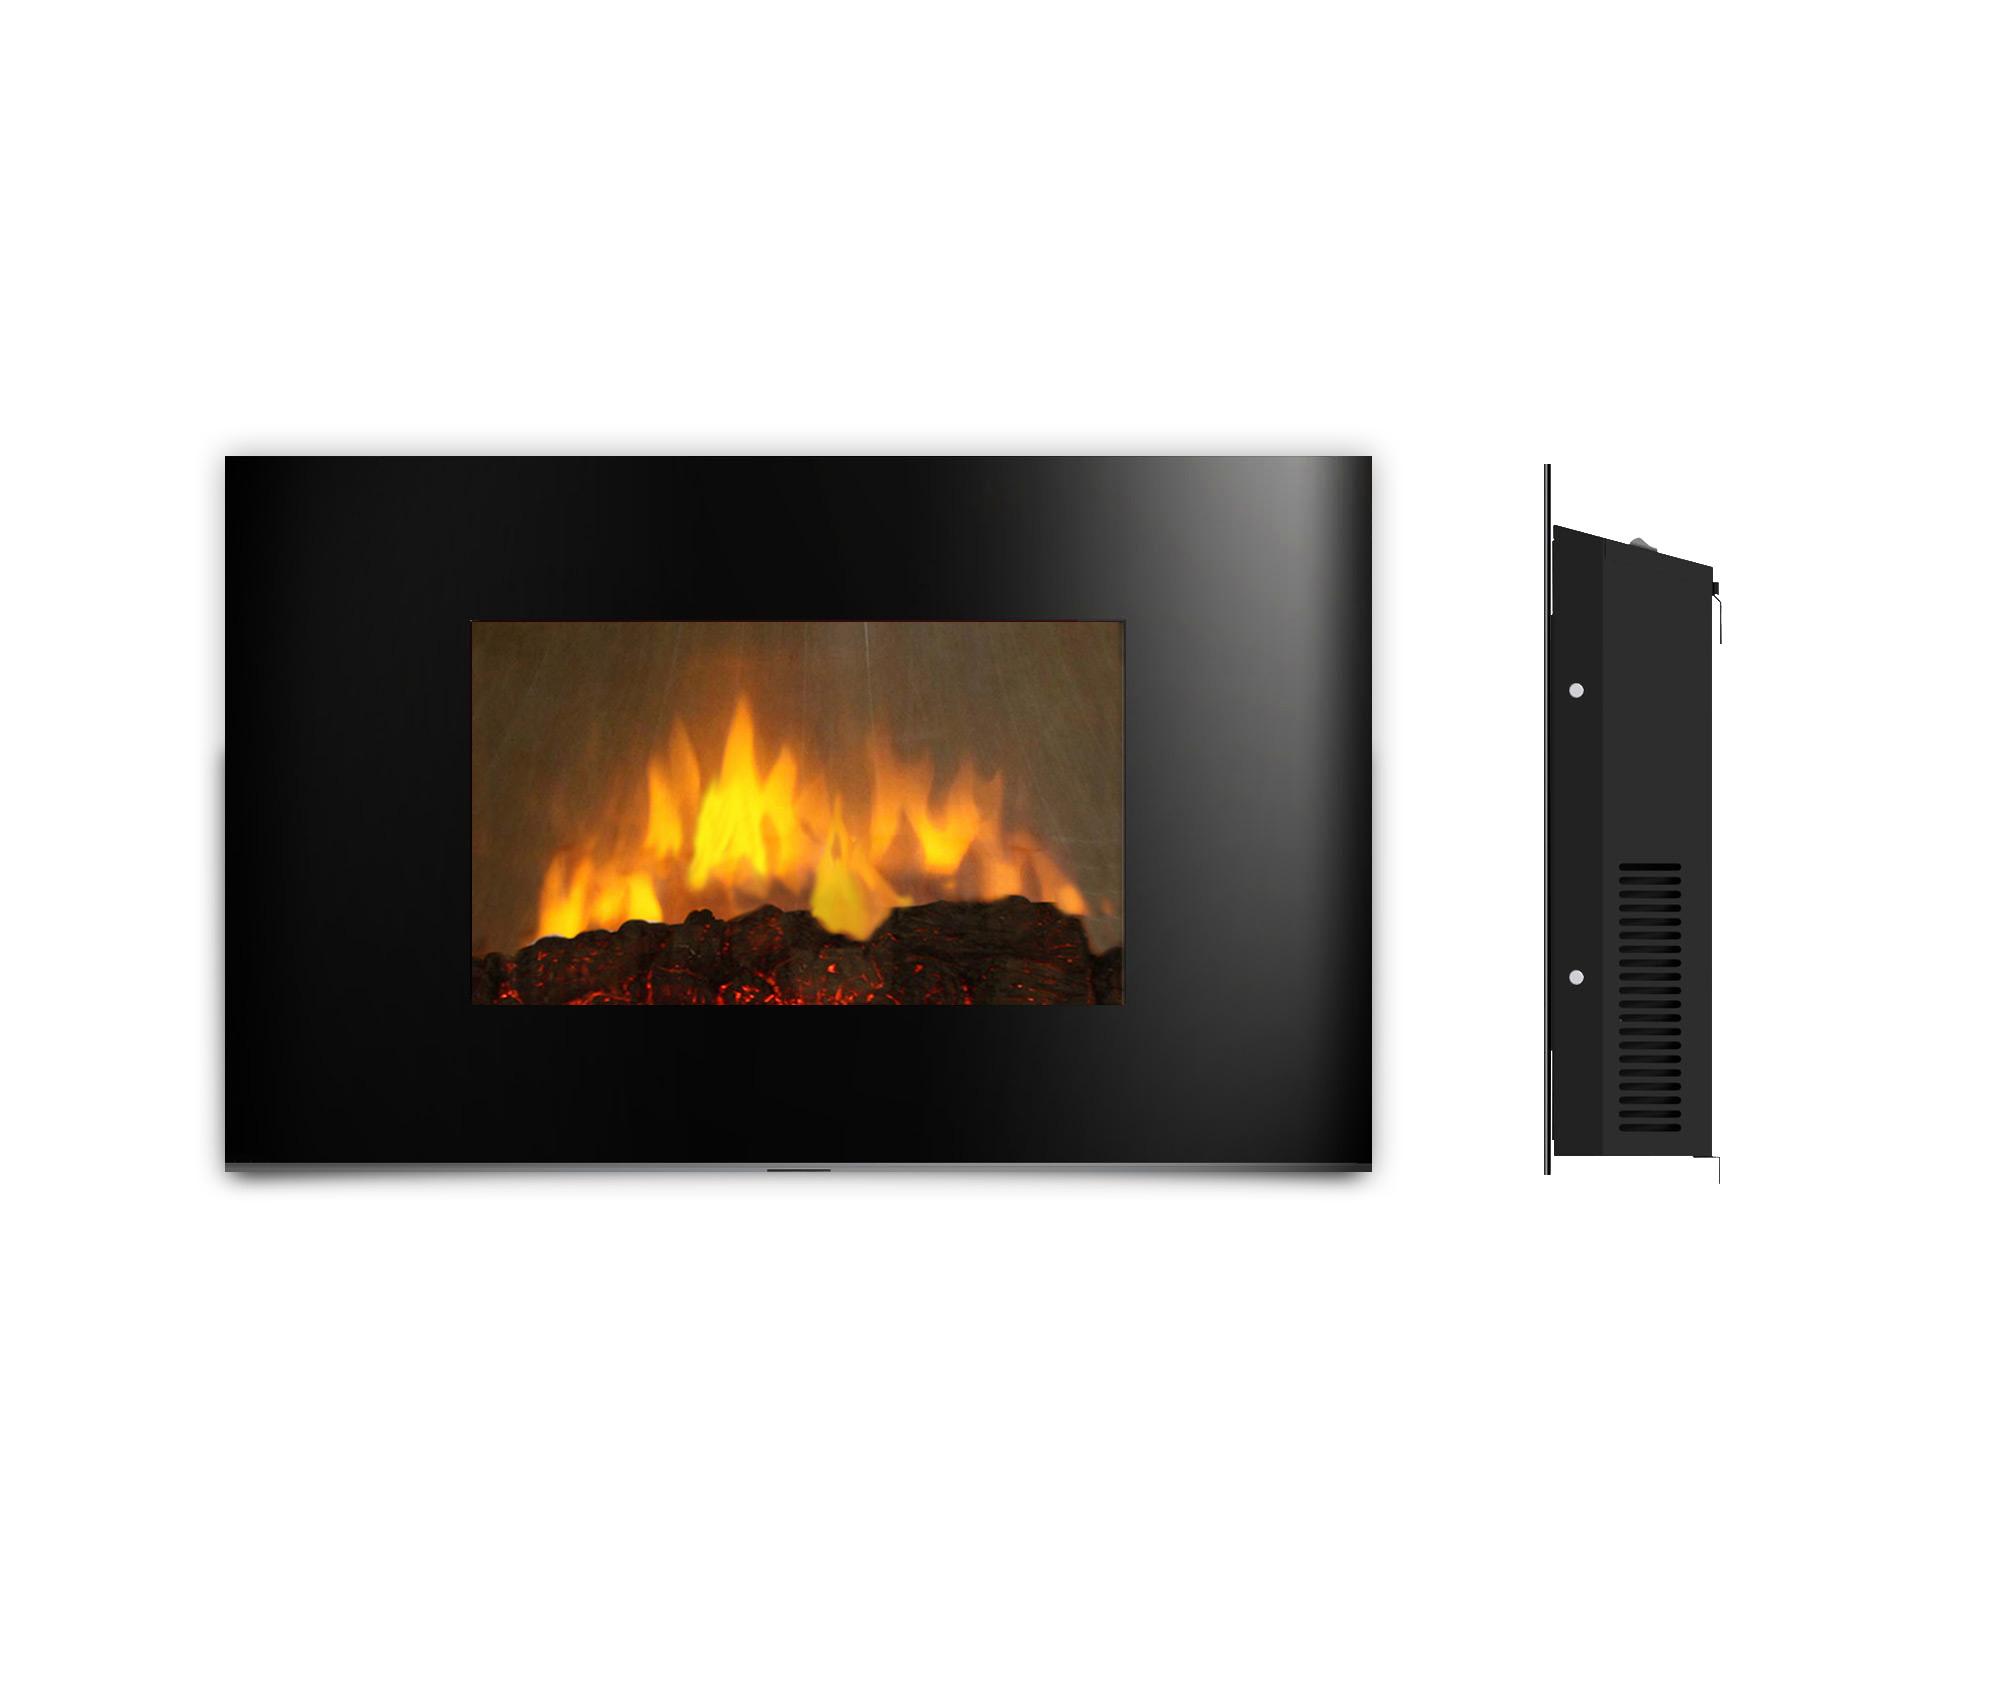 AMBIONAIR FLAME - LED Wall-Mounted Fireplace (EF-1510 BGL)